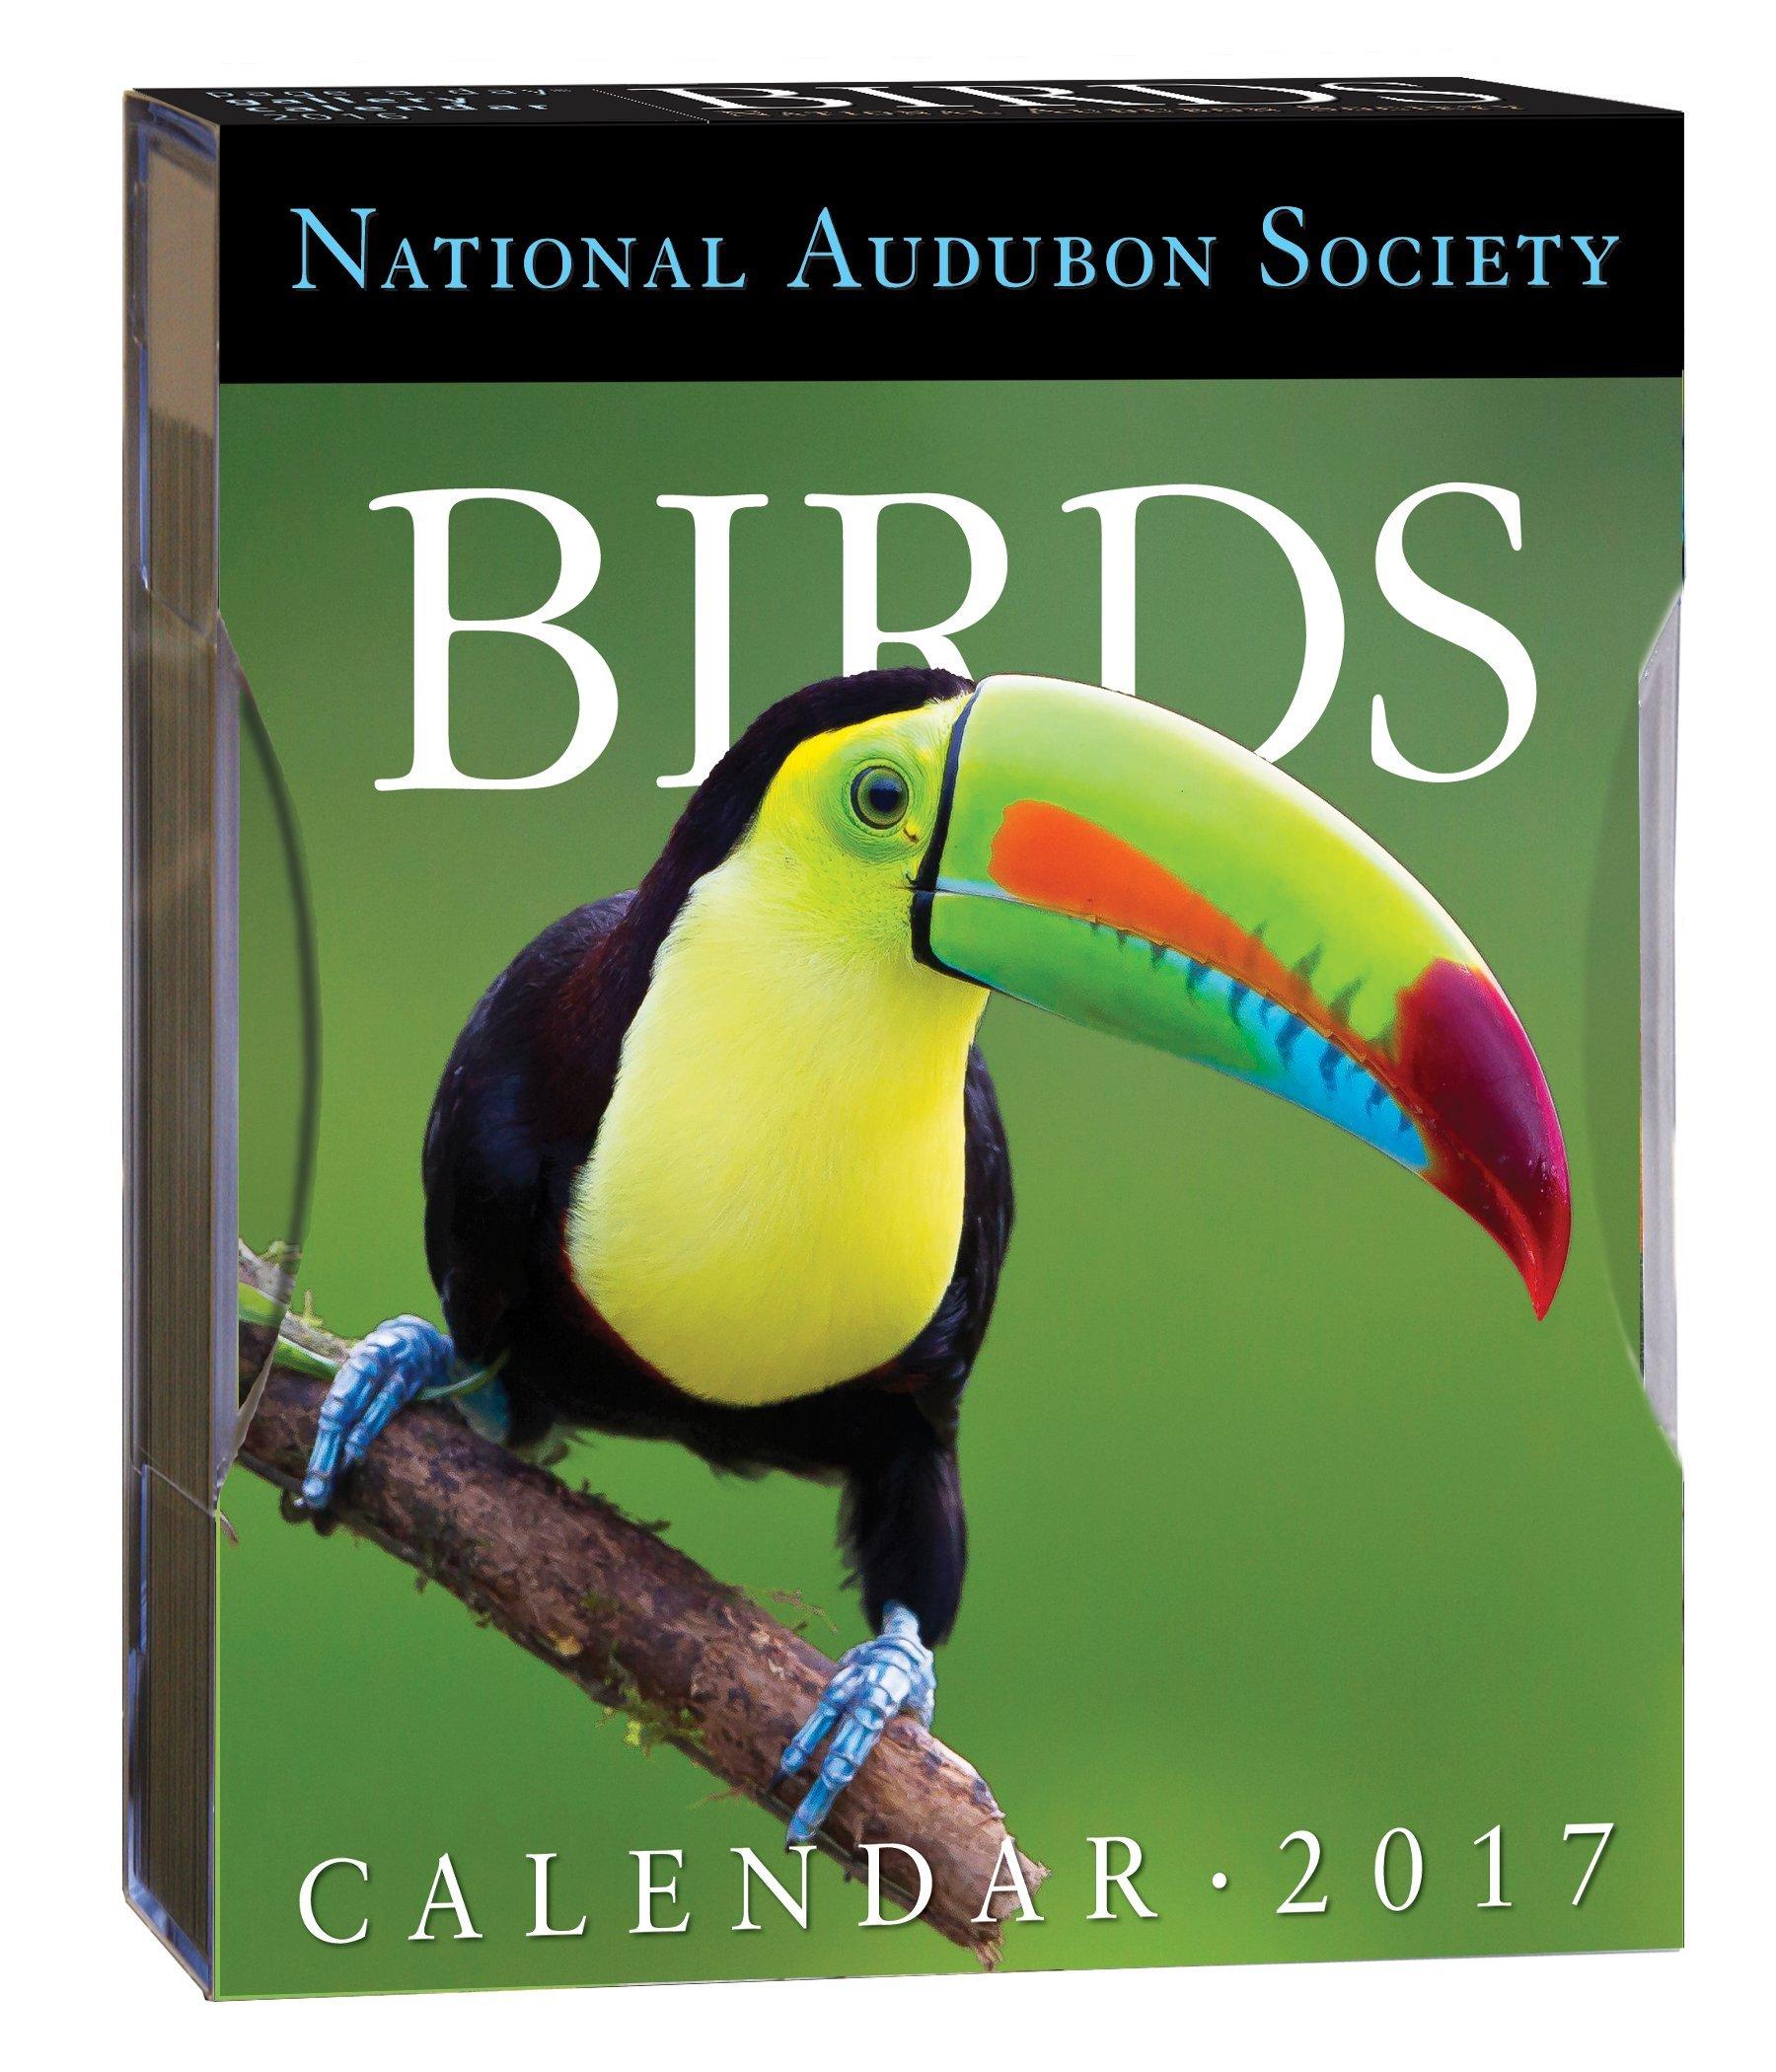 Birds Page-A-Day Gallery Calendar 2017 (Inglés) Calendario – Day to Day Calendar, Calendario de escritorio National Audubon Society 0761190104 Animals - Birds Photography